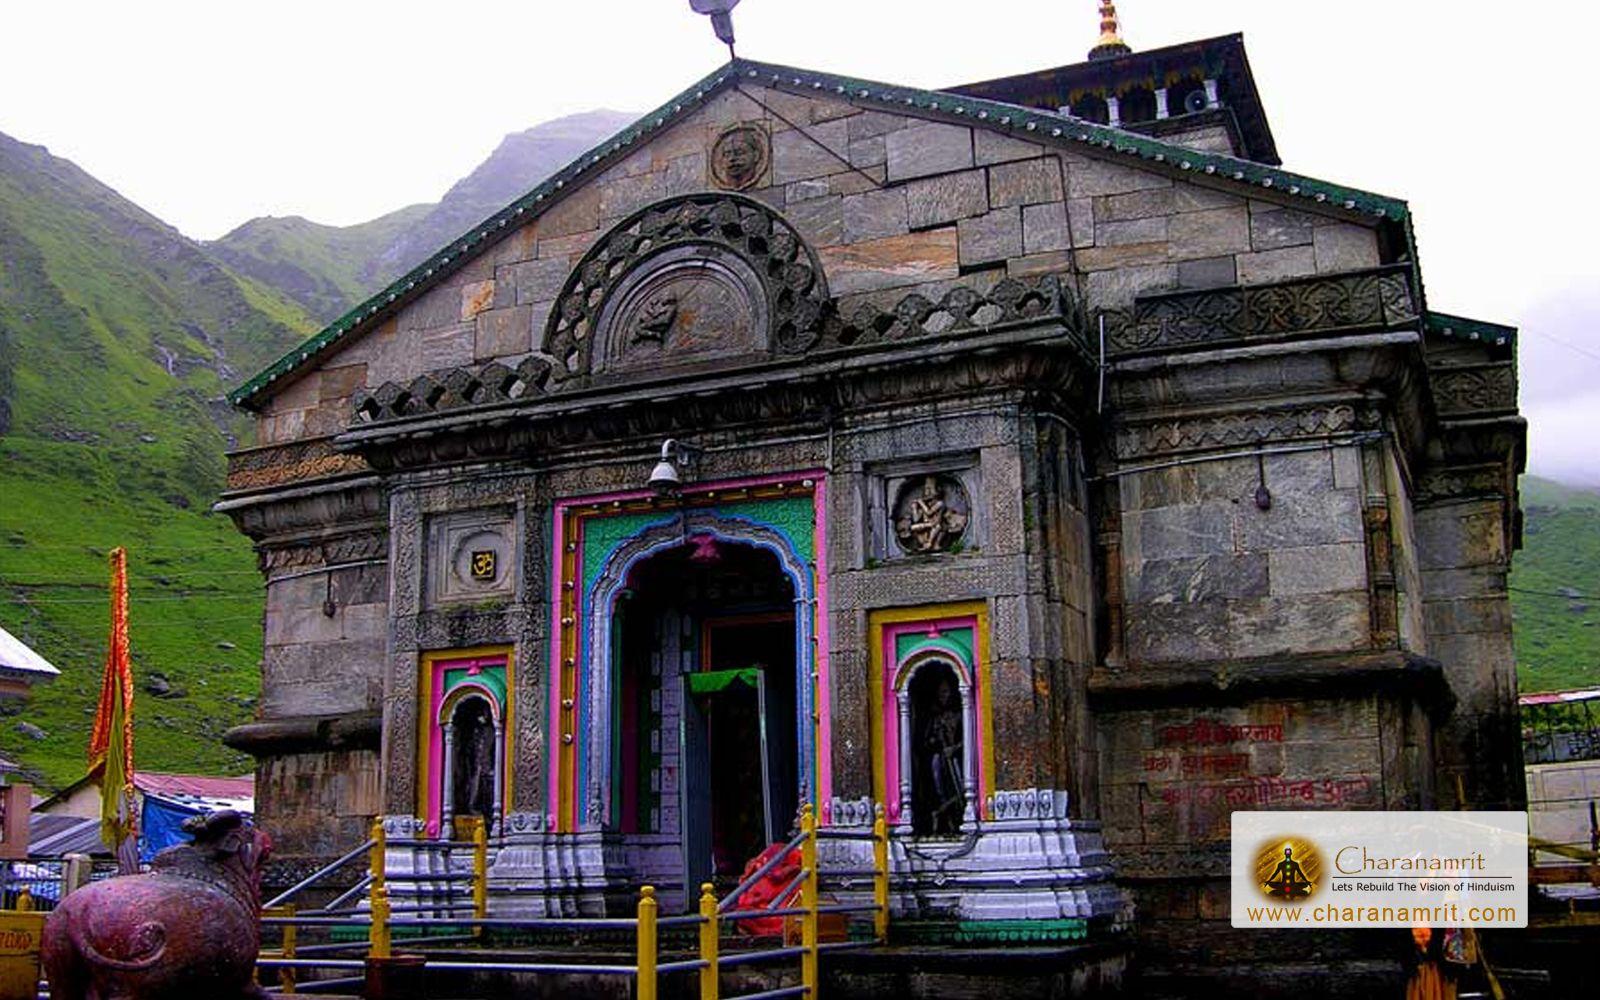 Hd wallpaper uttarakhand -  Charanamrit Uttarakhand Most Popular Temples Yamunotri And Kedarnath Were Closed On